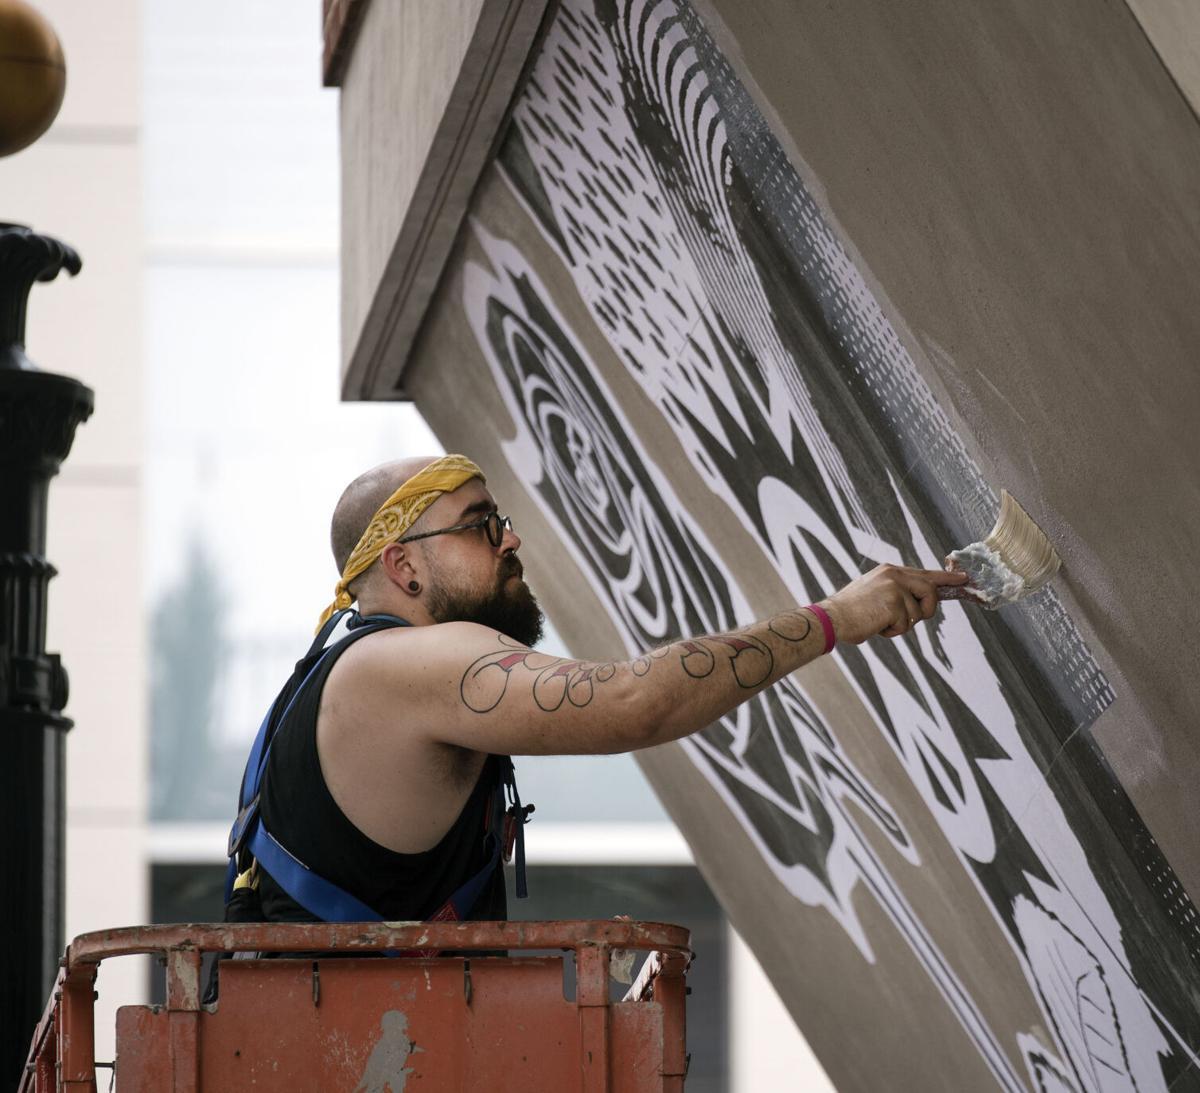 Artist Adam Serrano